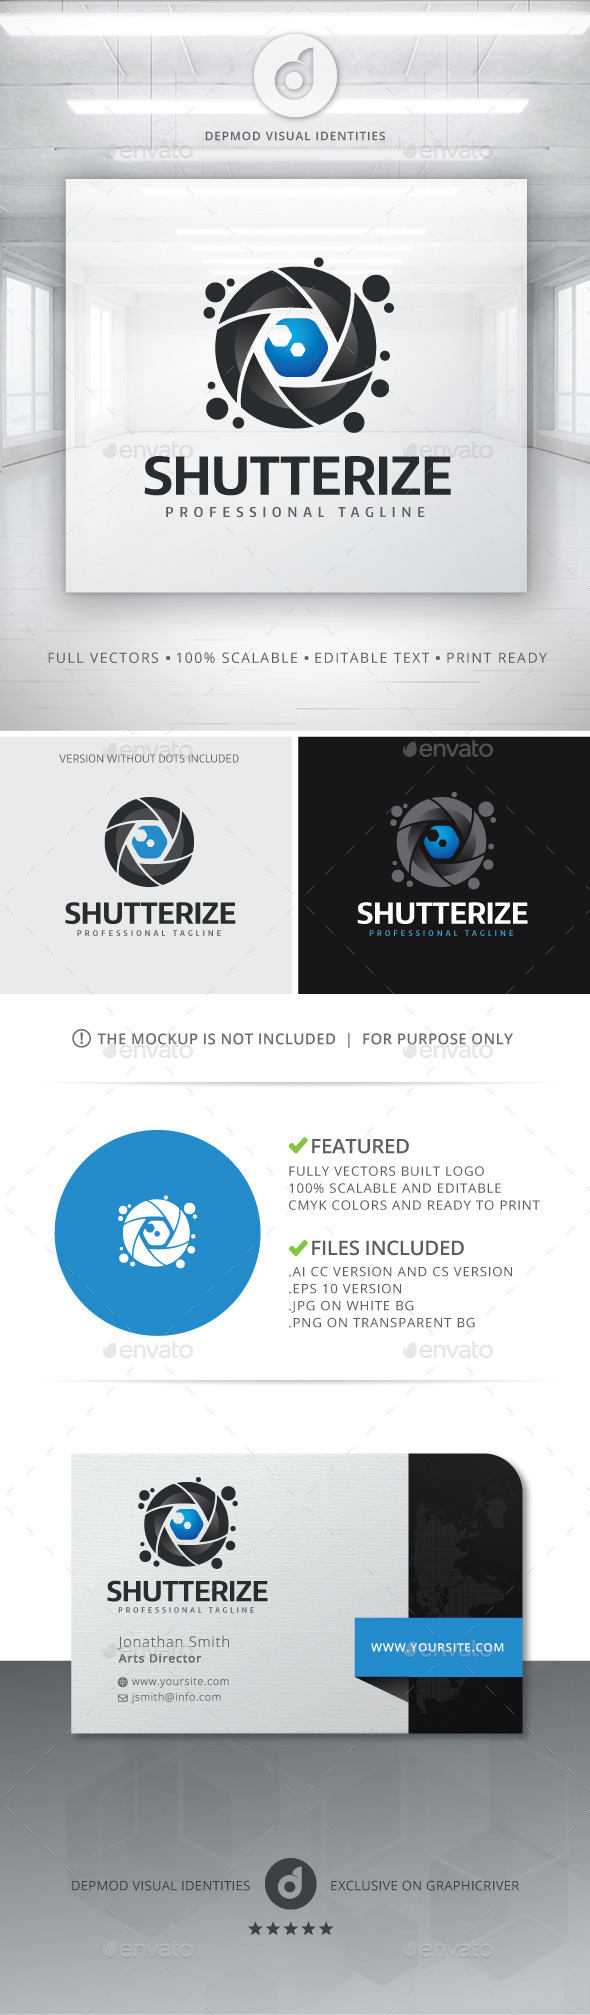 Shutterize Logo